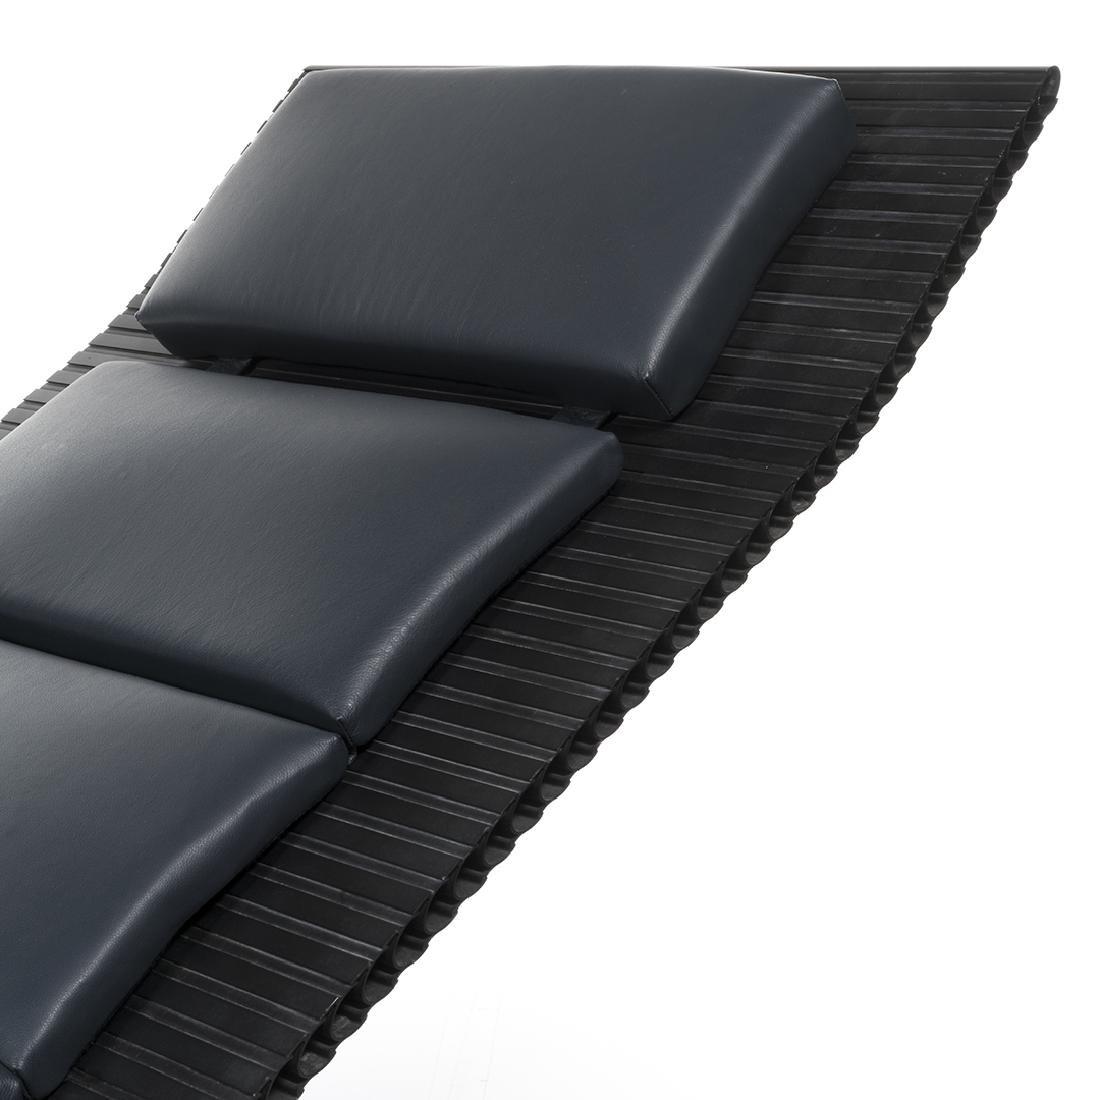 Star Trek Chaise - 5